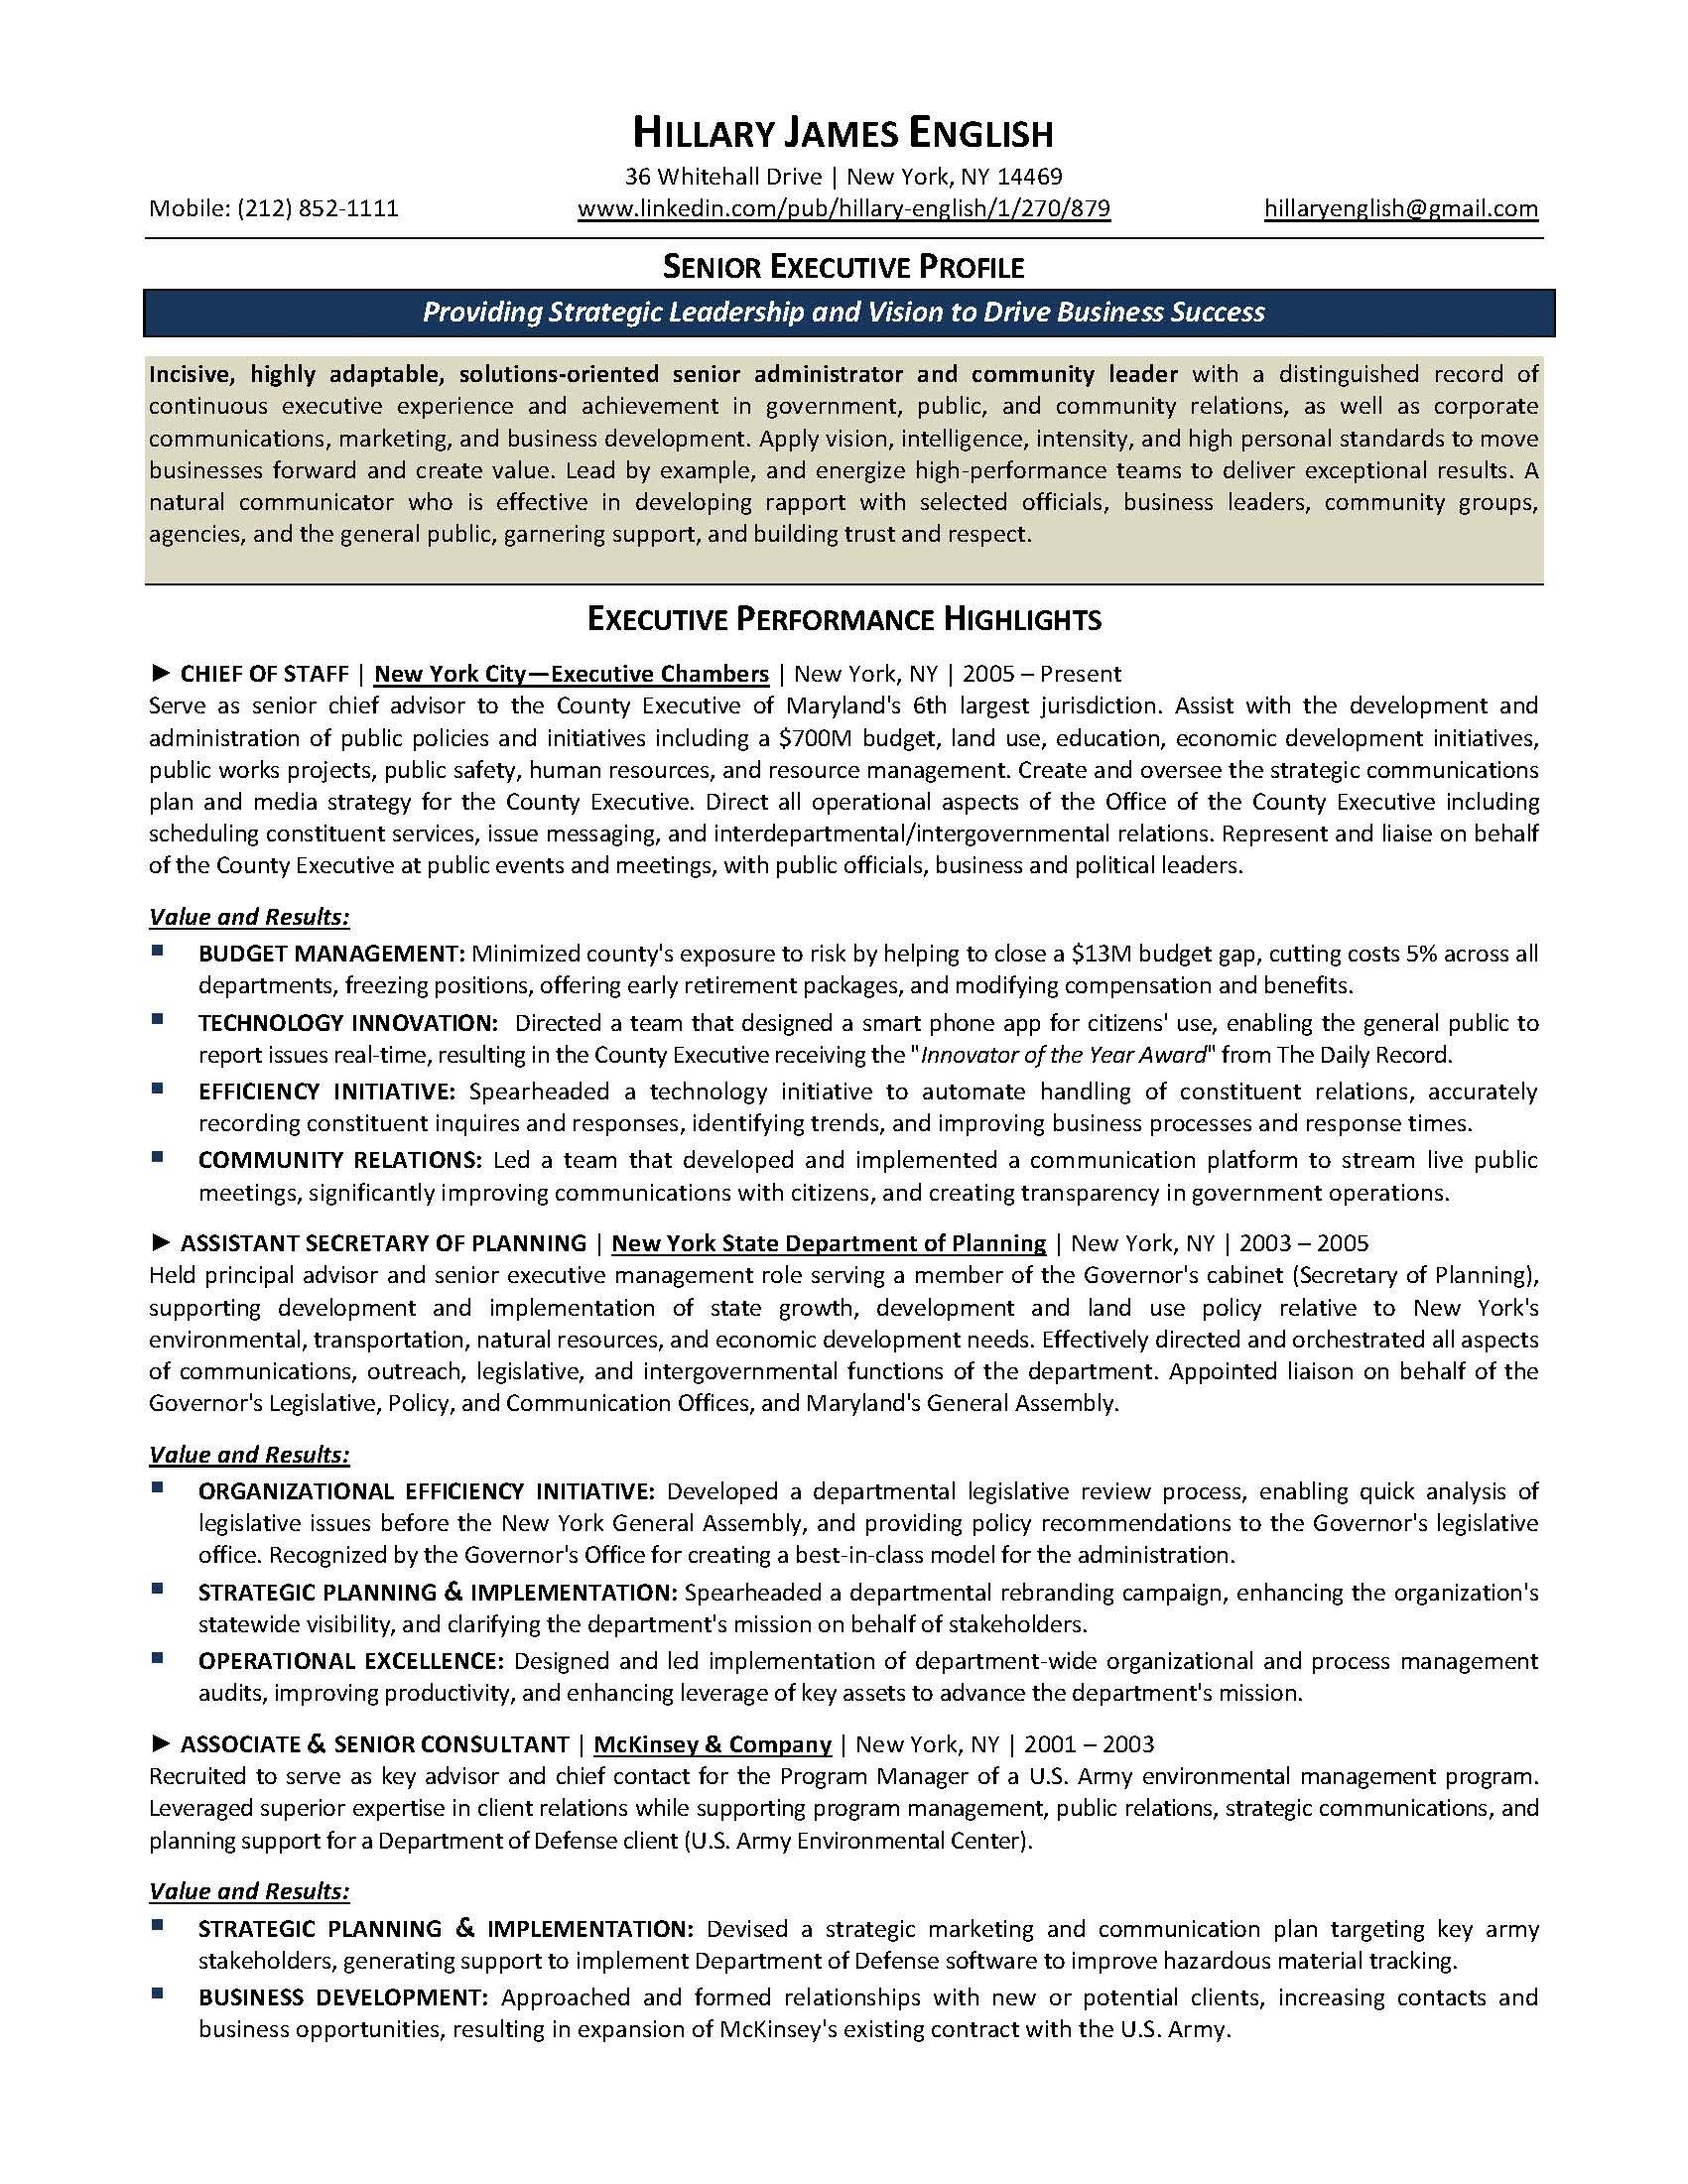 Terrorism pdf essay grasp, Skills, ground